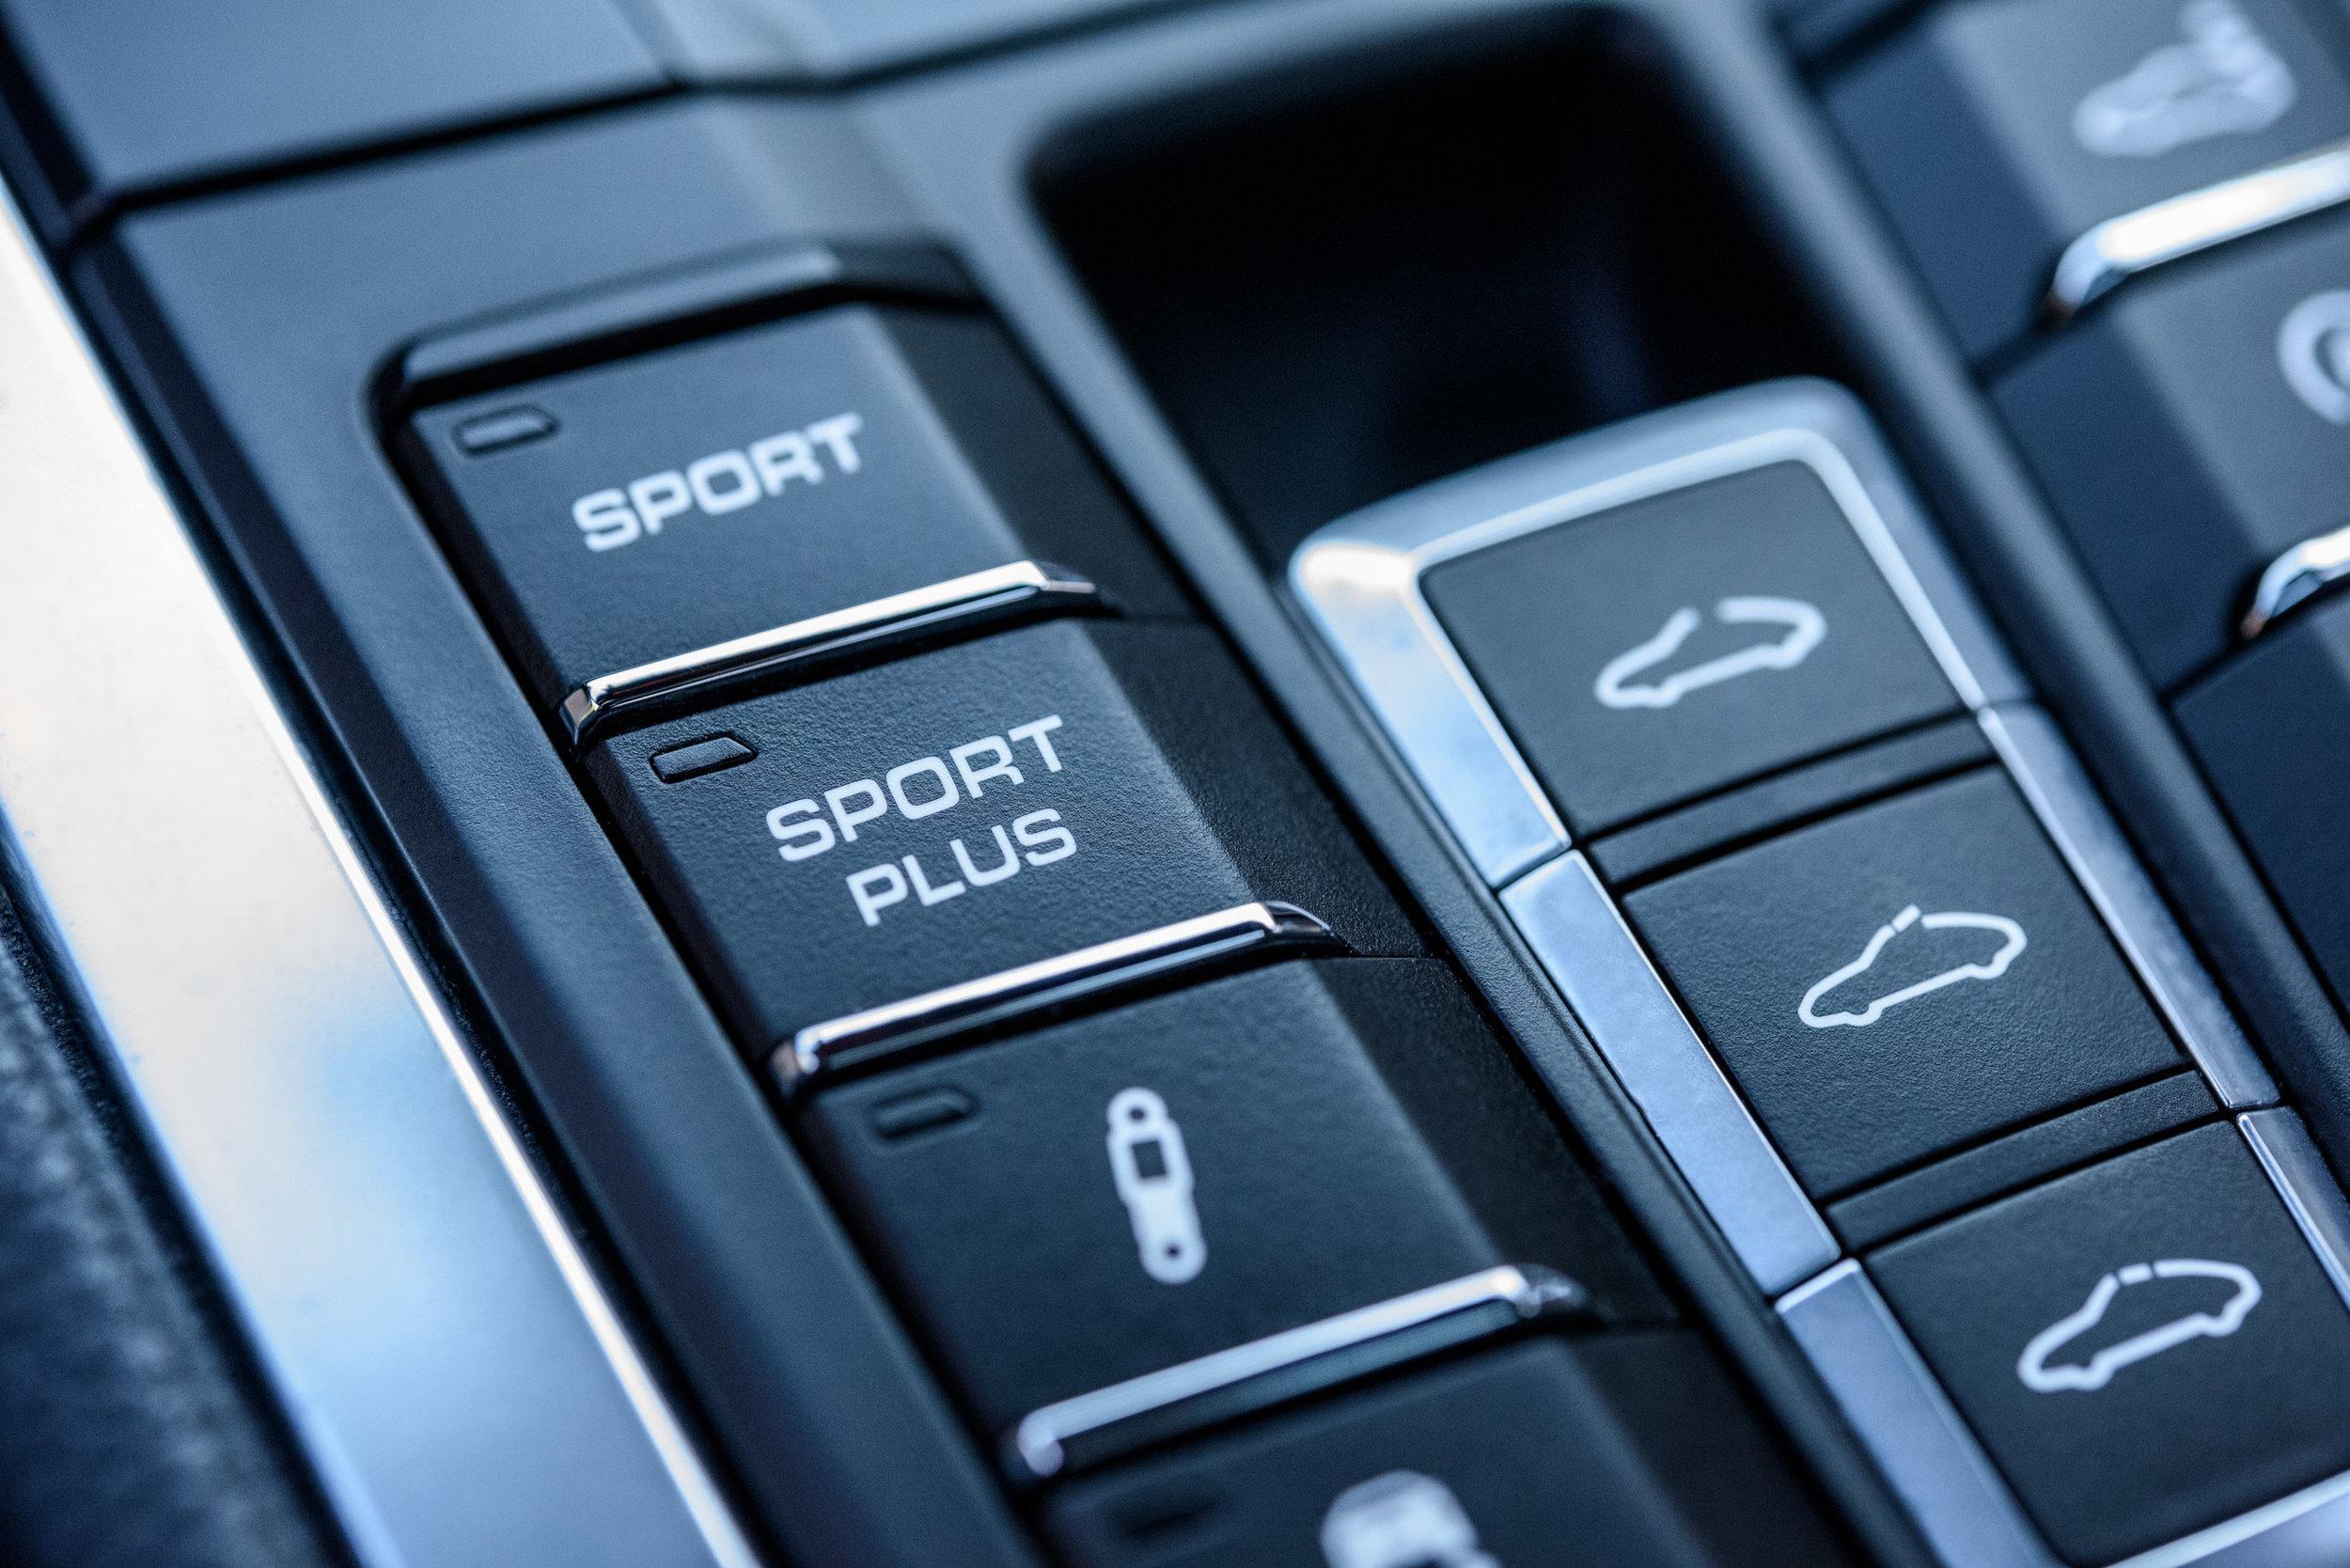 porsche 911 carrera s 2012 sport plus mode by Jordan Reeder